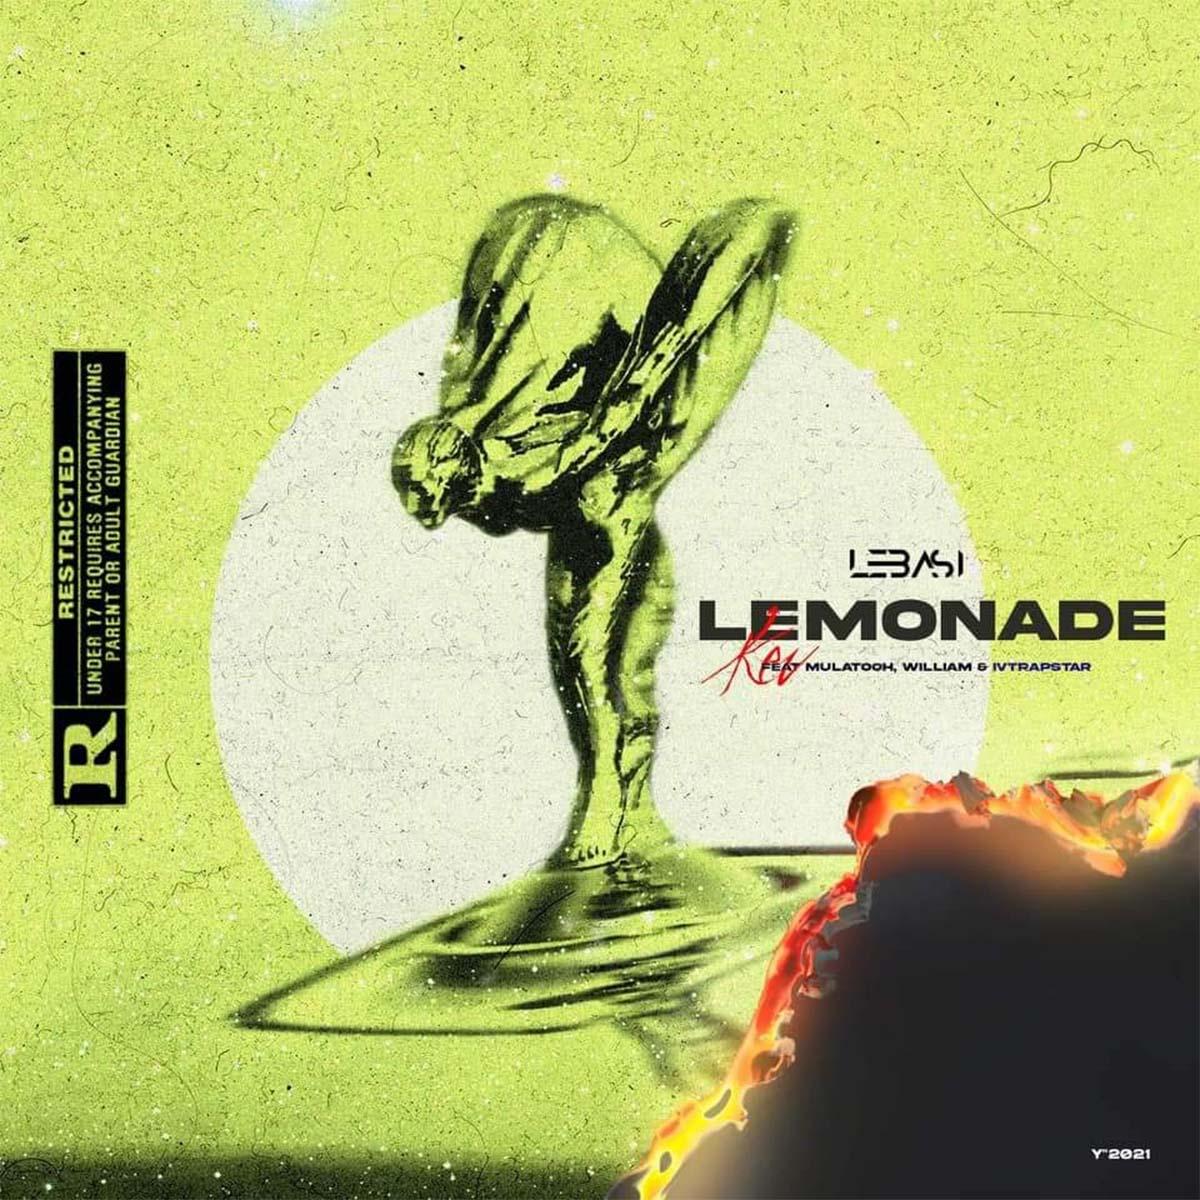 Kev - Lemonade (feat. Mulatooh, William Sardinha & Ivtrapstar)